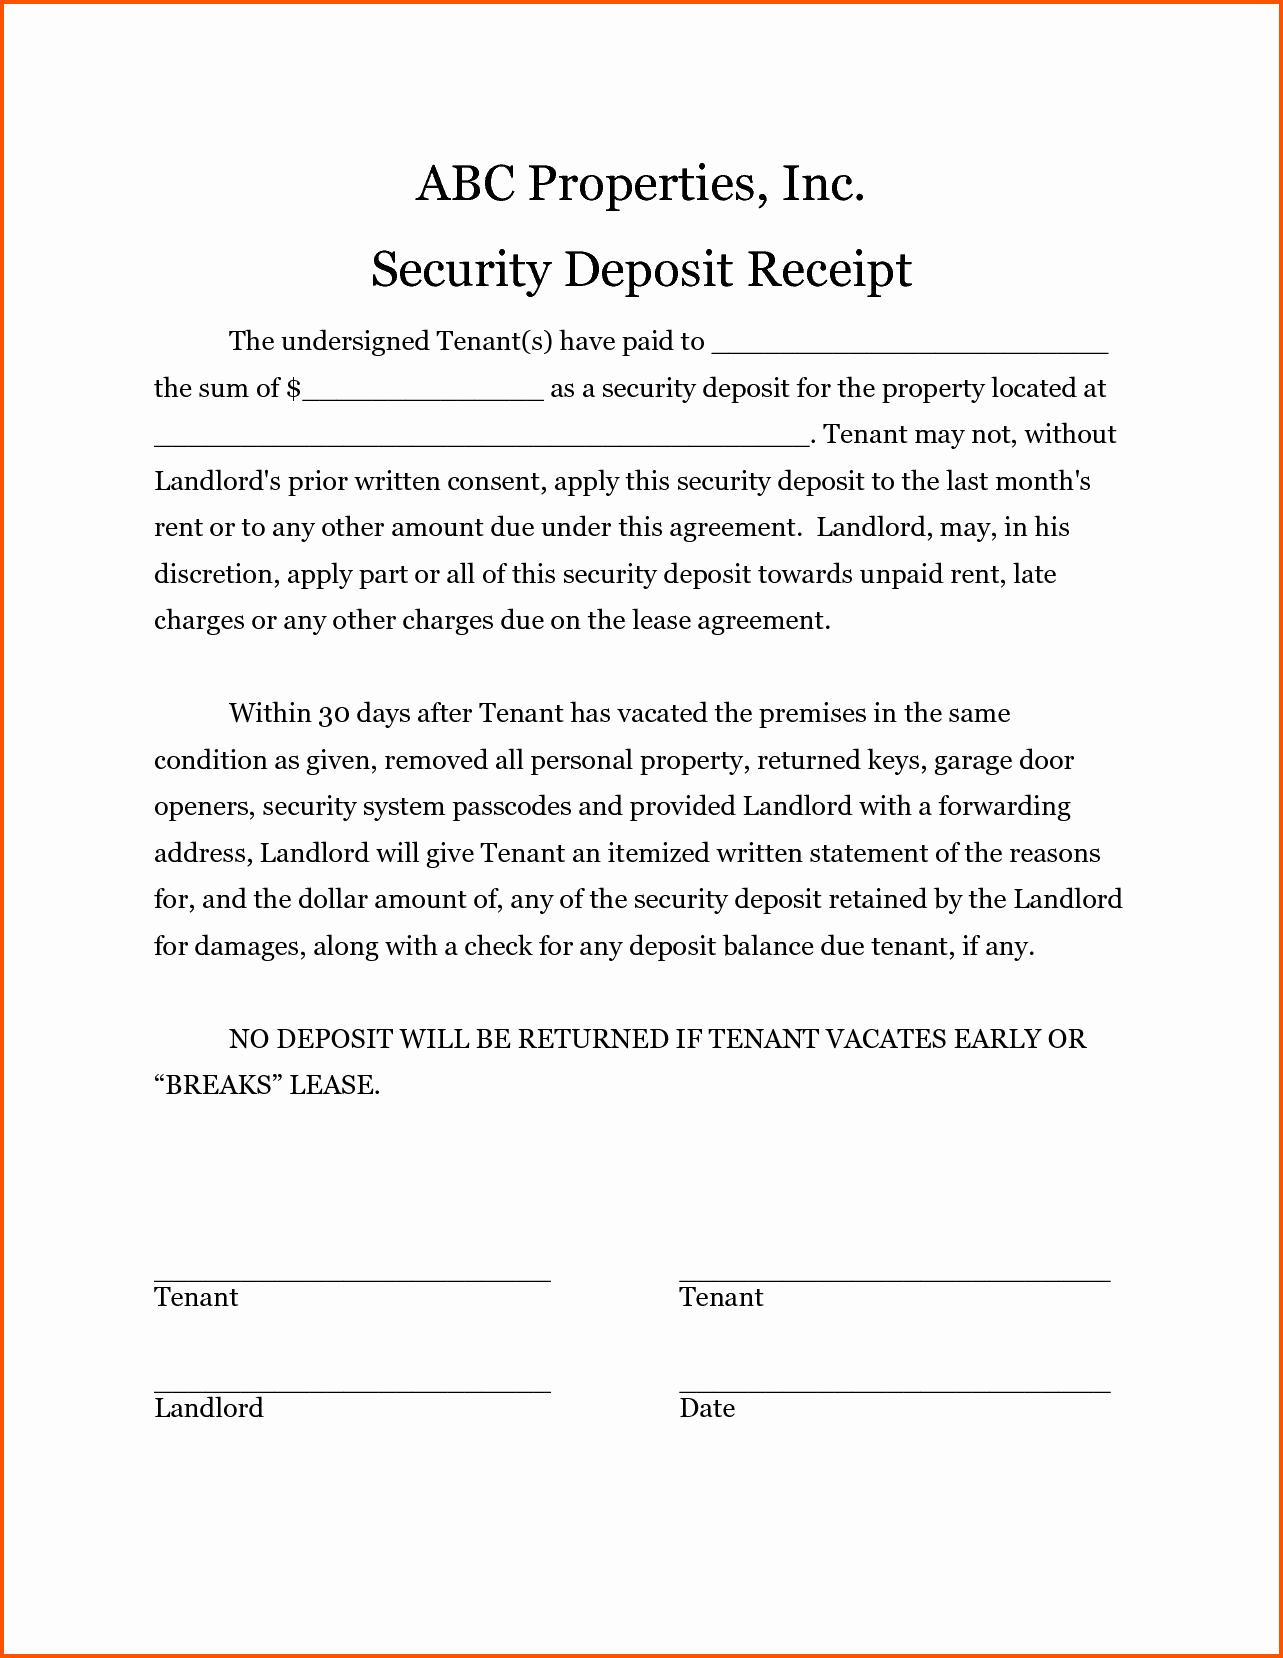 Non Refundable Deposit form Template Elegant 15 Security Deposit Receipt